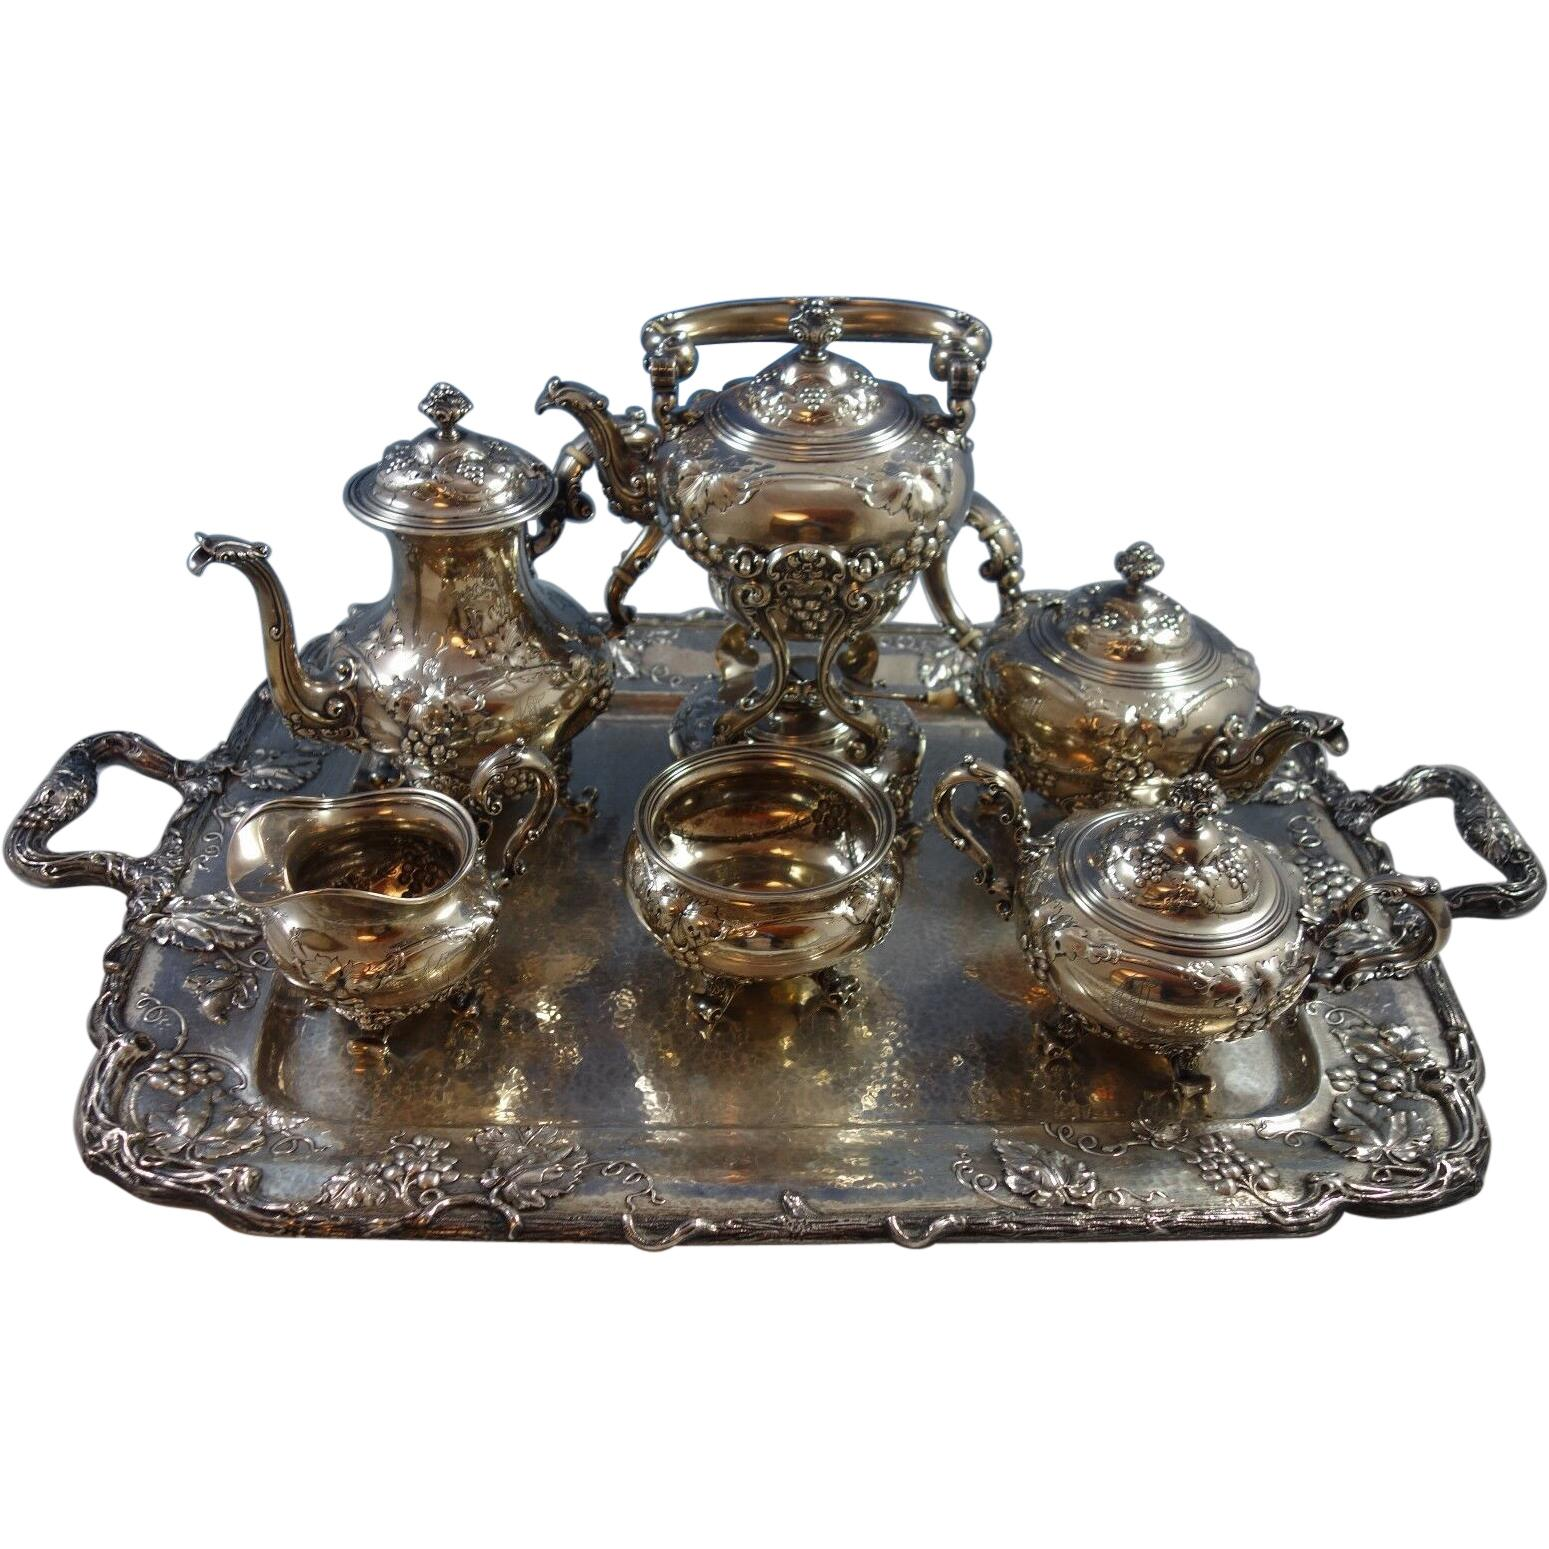 Modernic by Gorham Sterling Silver Tea Set 6-Piece & Tray #1818B '#1918' Grapes